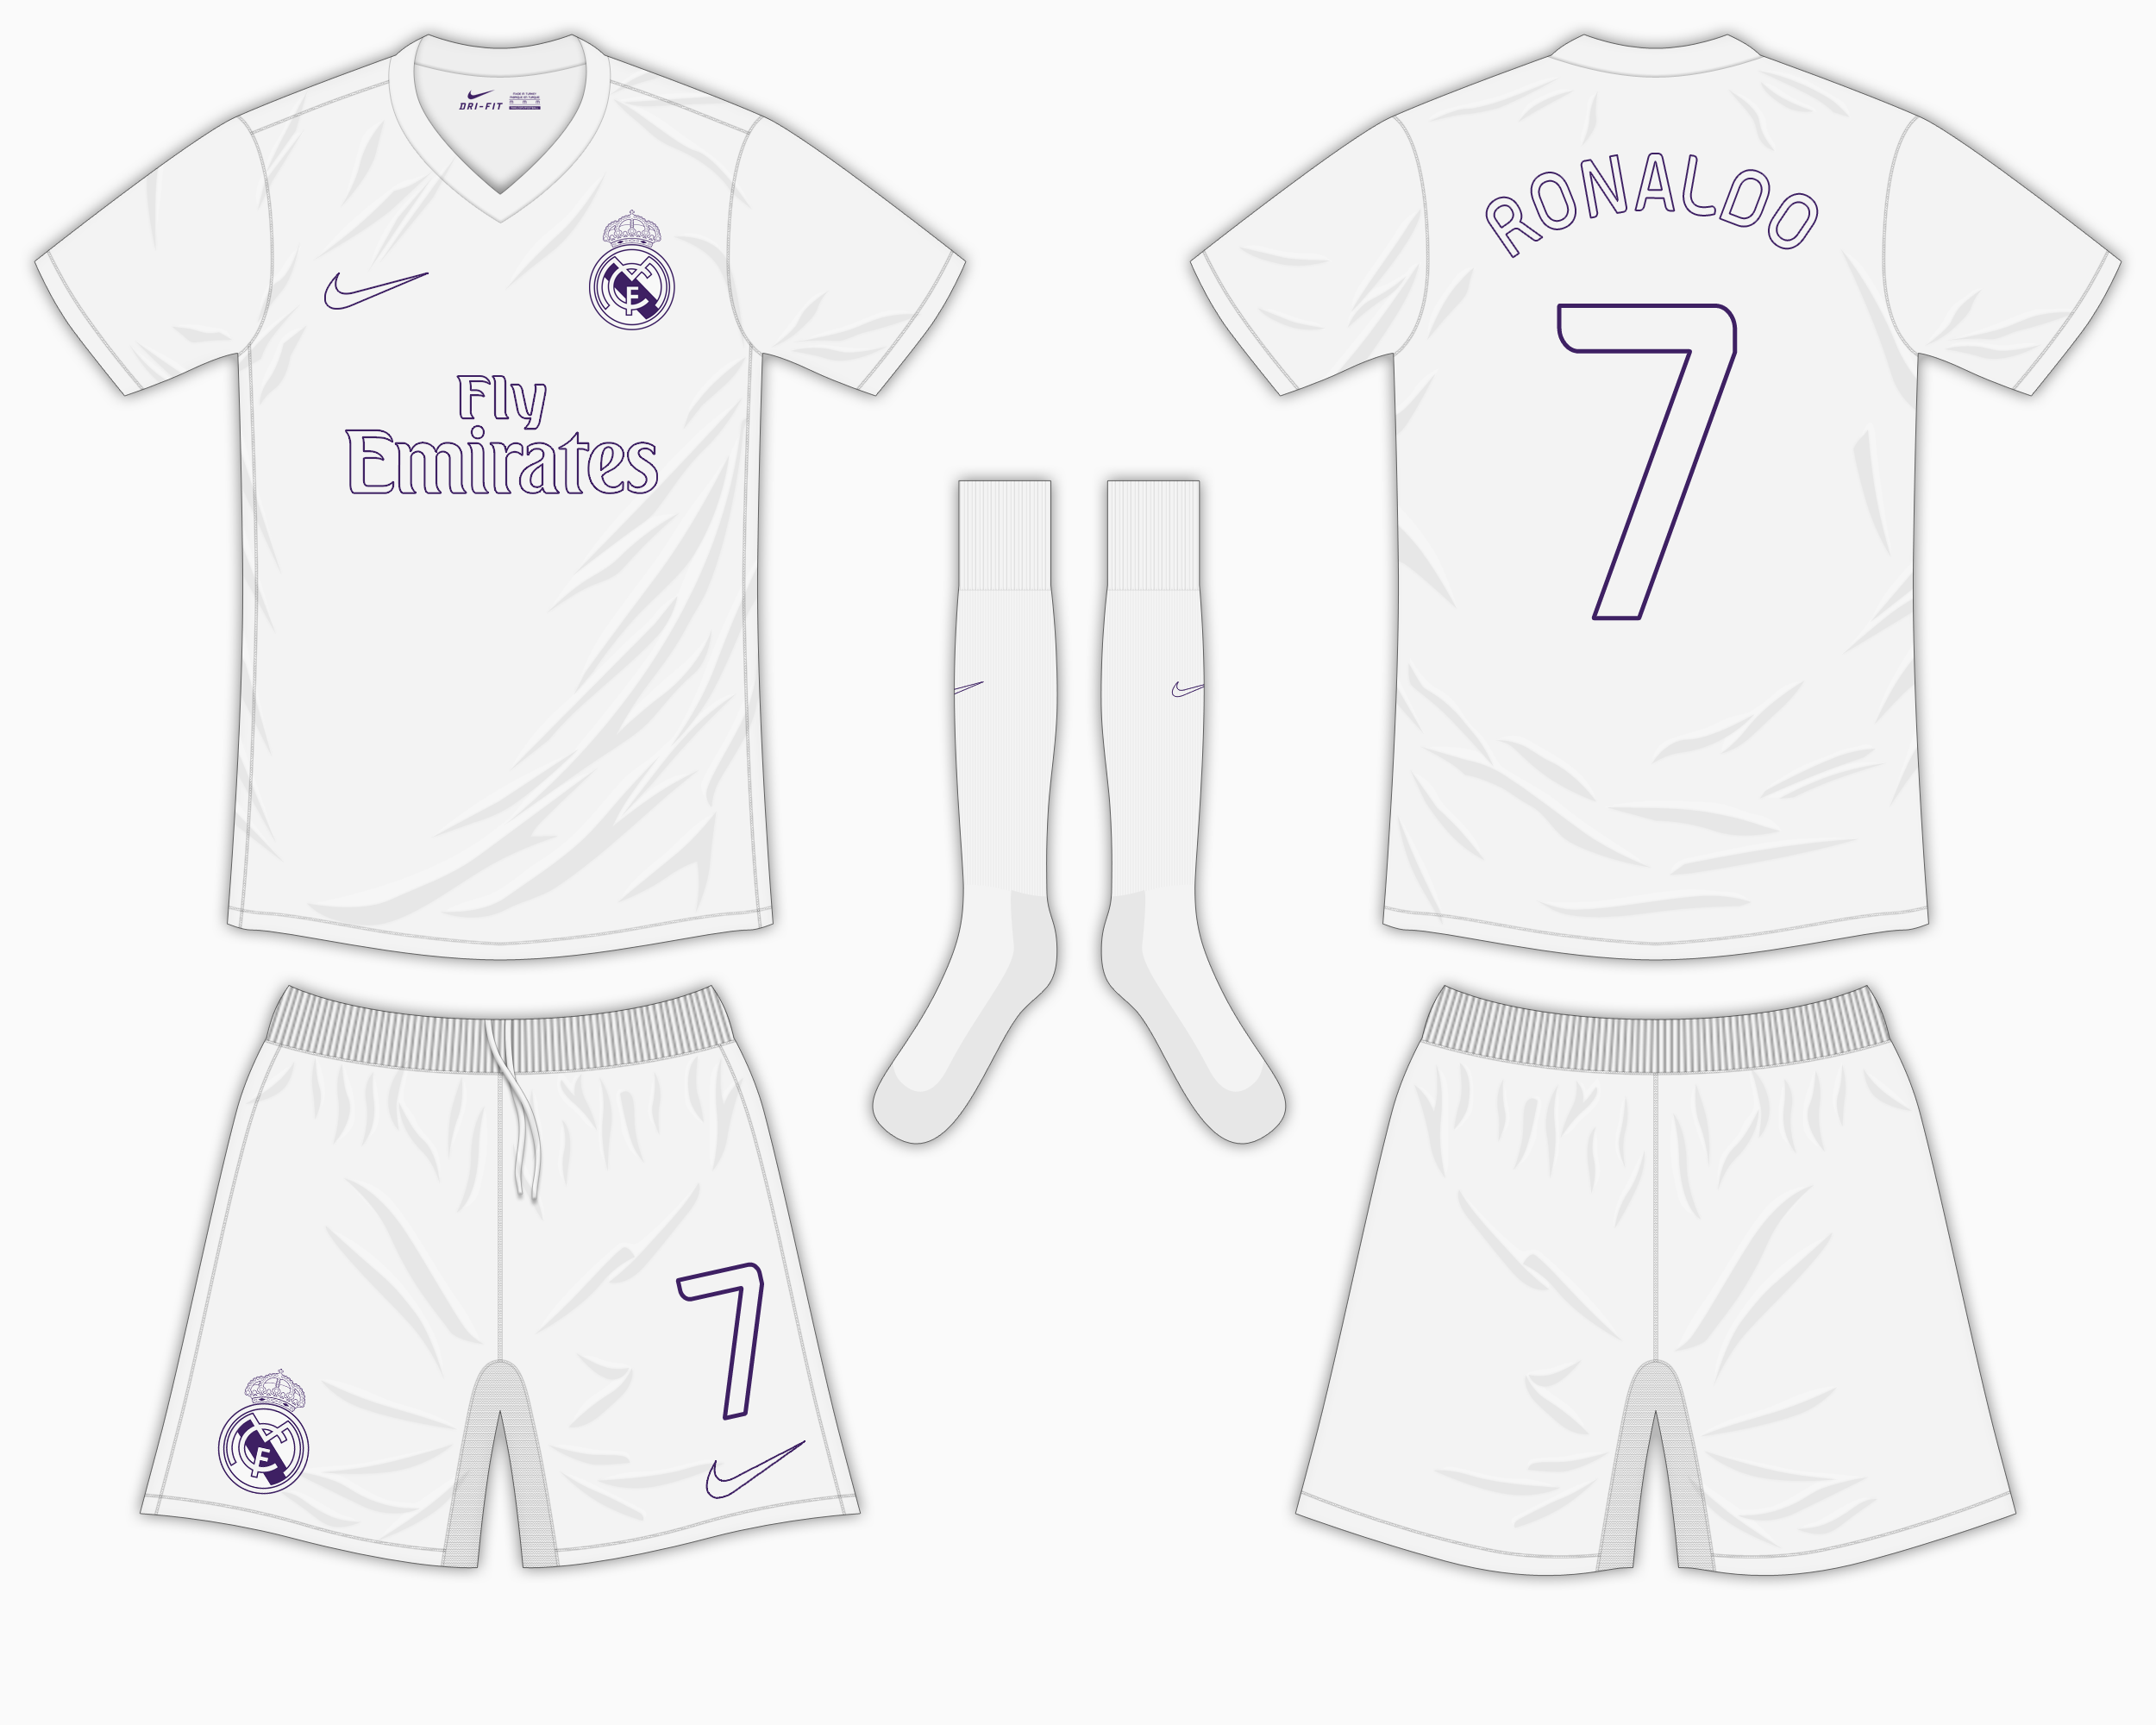 648db6aa655 Real Madrid Home Kit - Nike